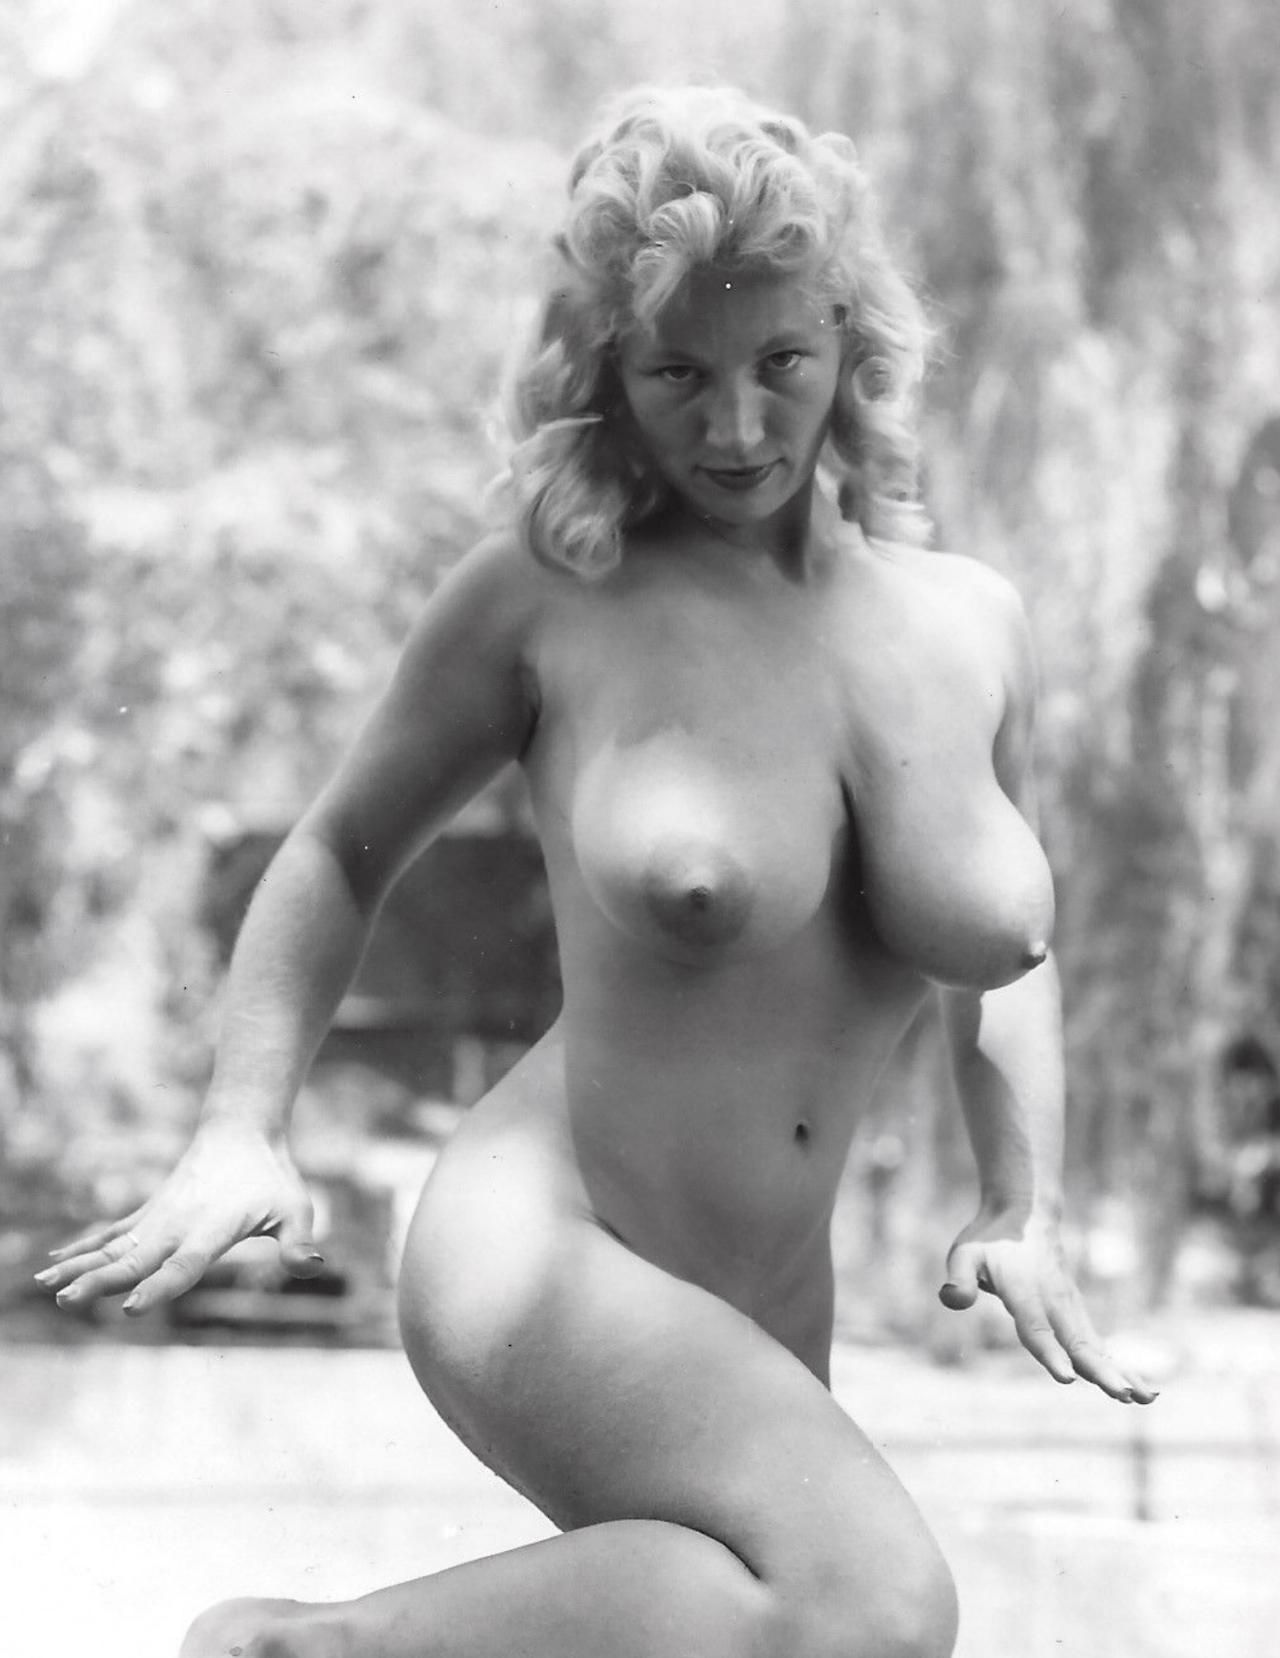 Nude Virginia Women Pics 2